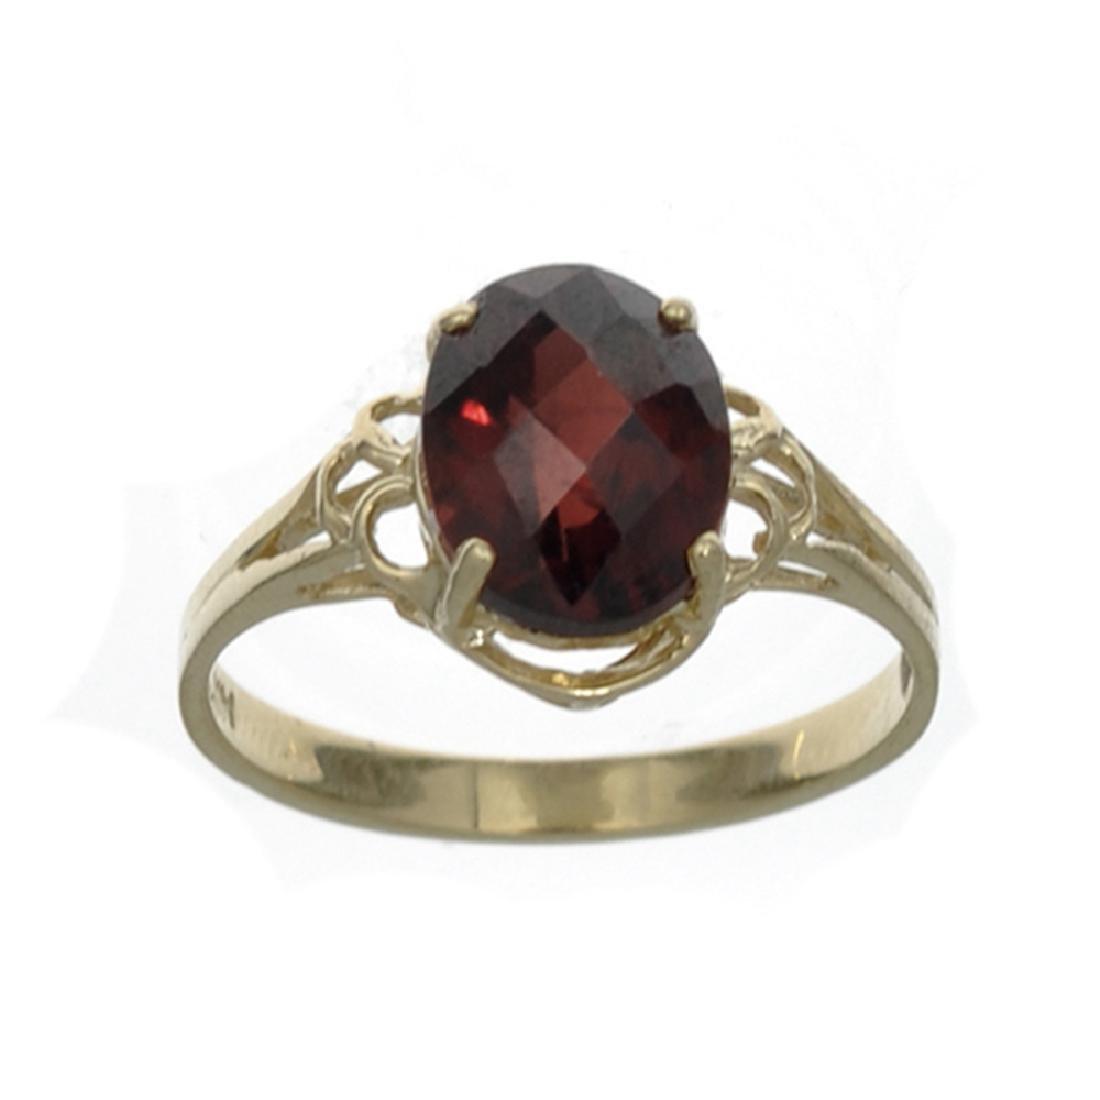 APP: 0.6k Fine Jewelry 14 KT Gold, 3.21CT Oval Cut Red